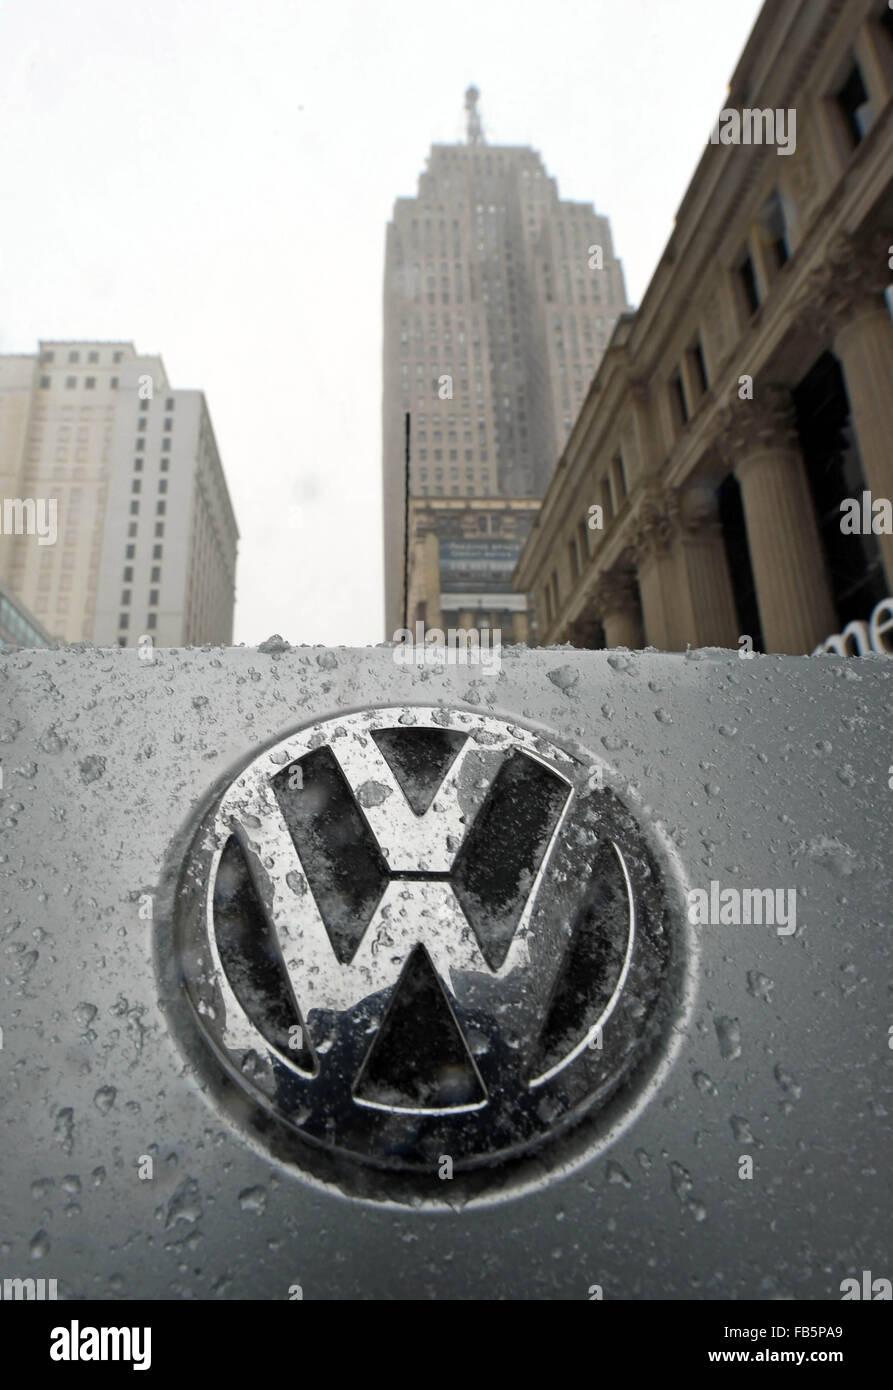 Snow Covered Volkswagen Logo Pictured Volkswagen Stock Photos Snow